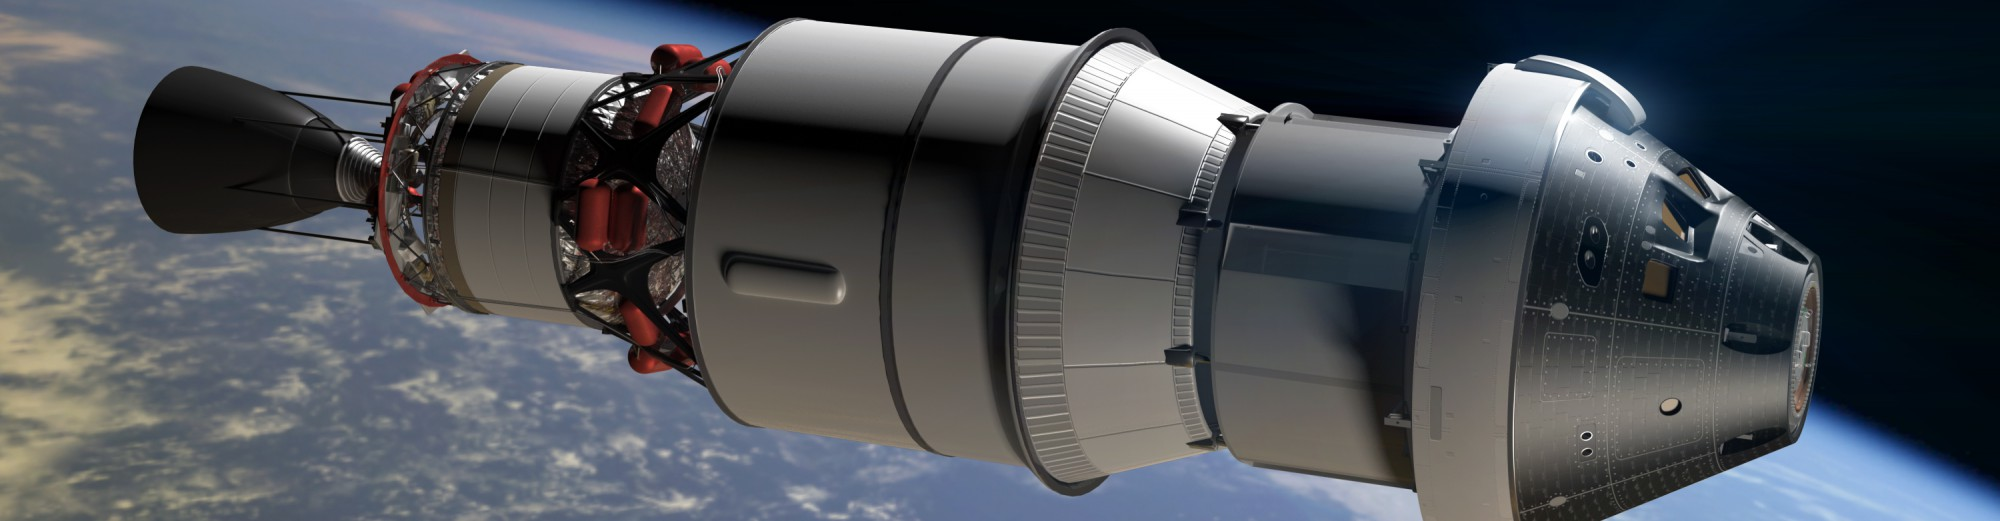 cropped-Orion_Exploration_Flight_Test_1.jpg